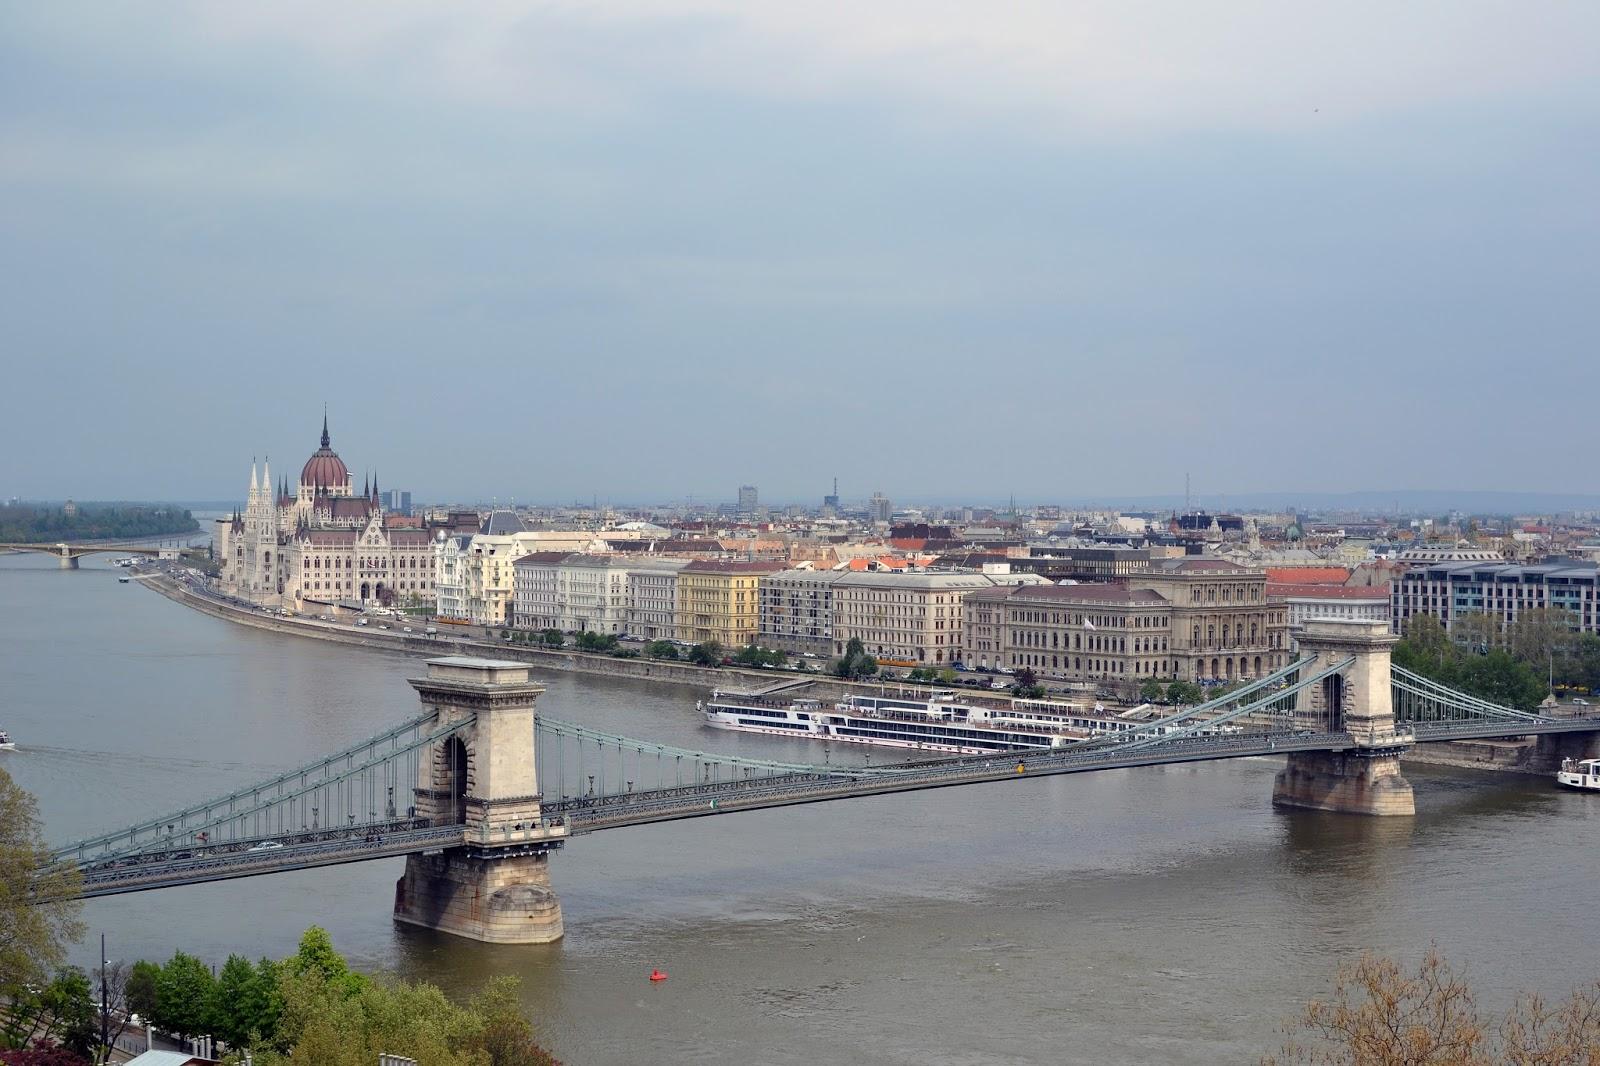 Budapest, photography, night time, architecture, travel, blog, adventure, exploration, chain bridge, danube